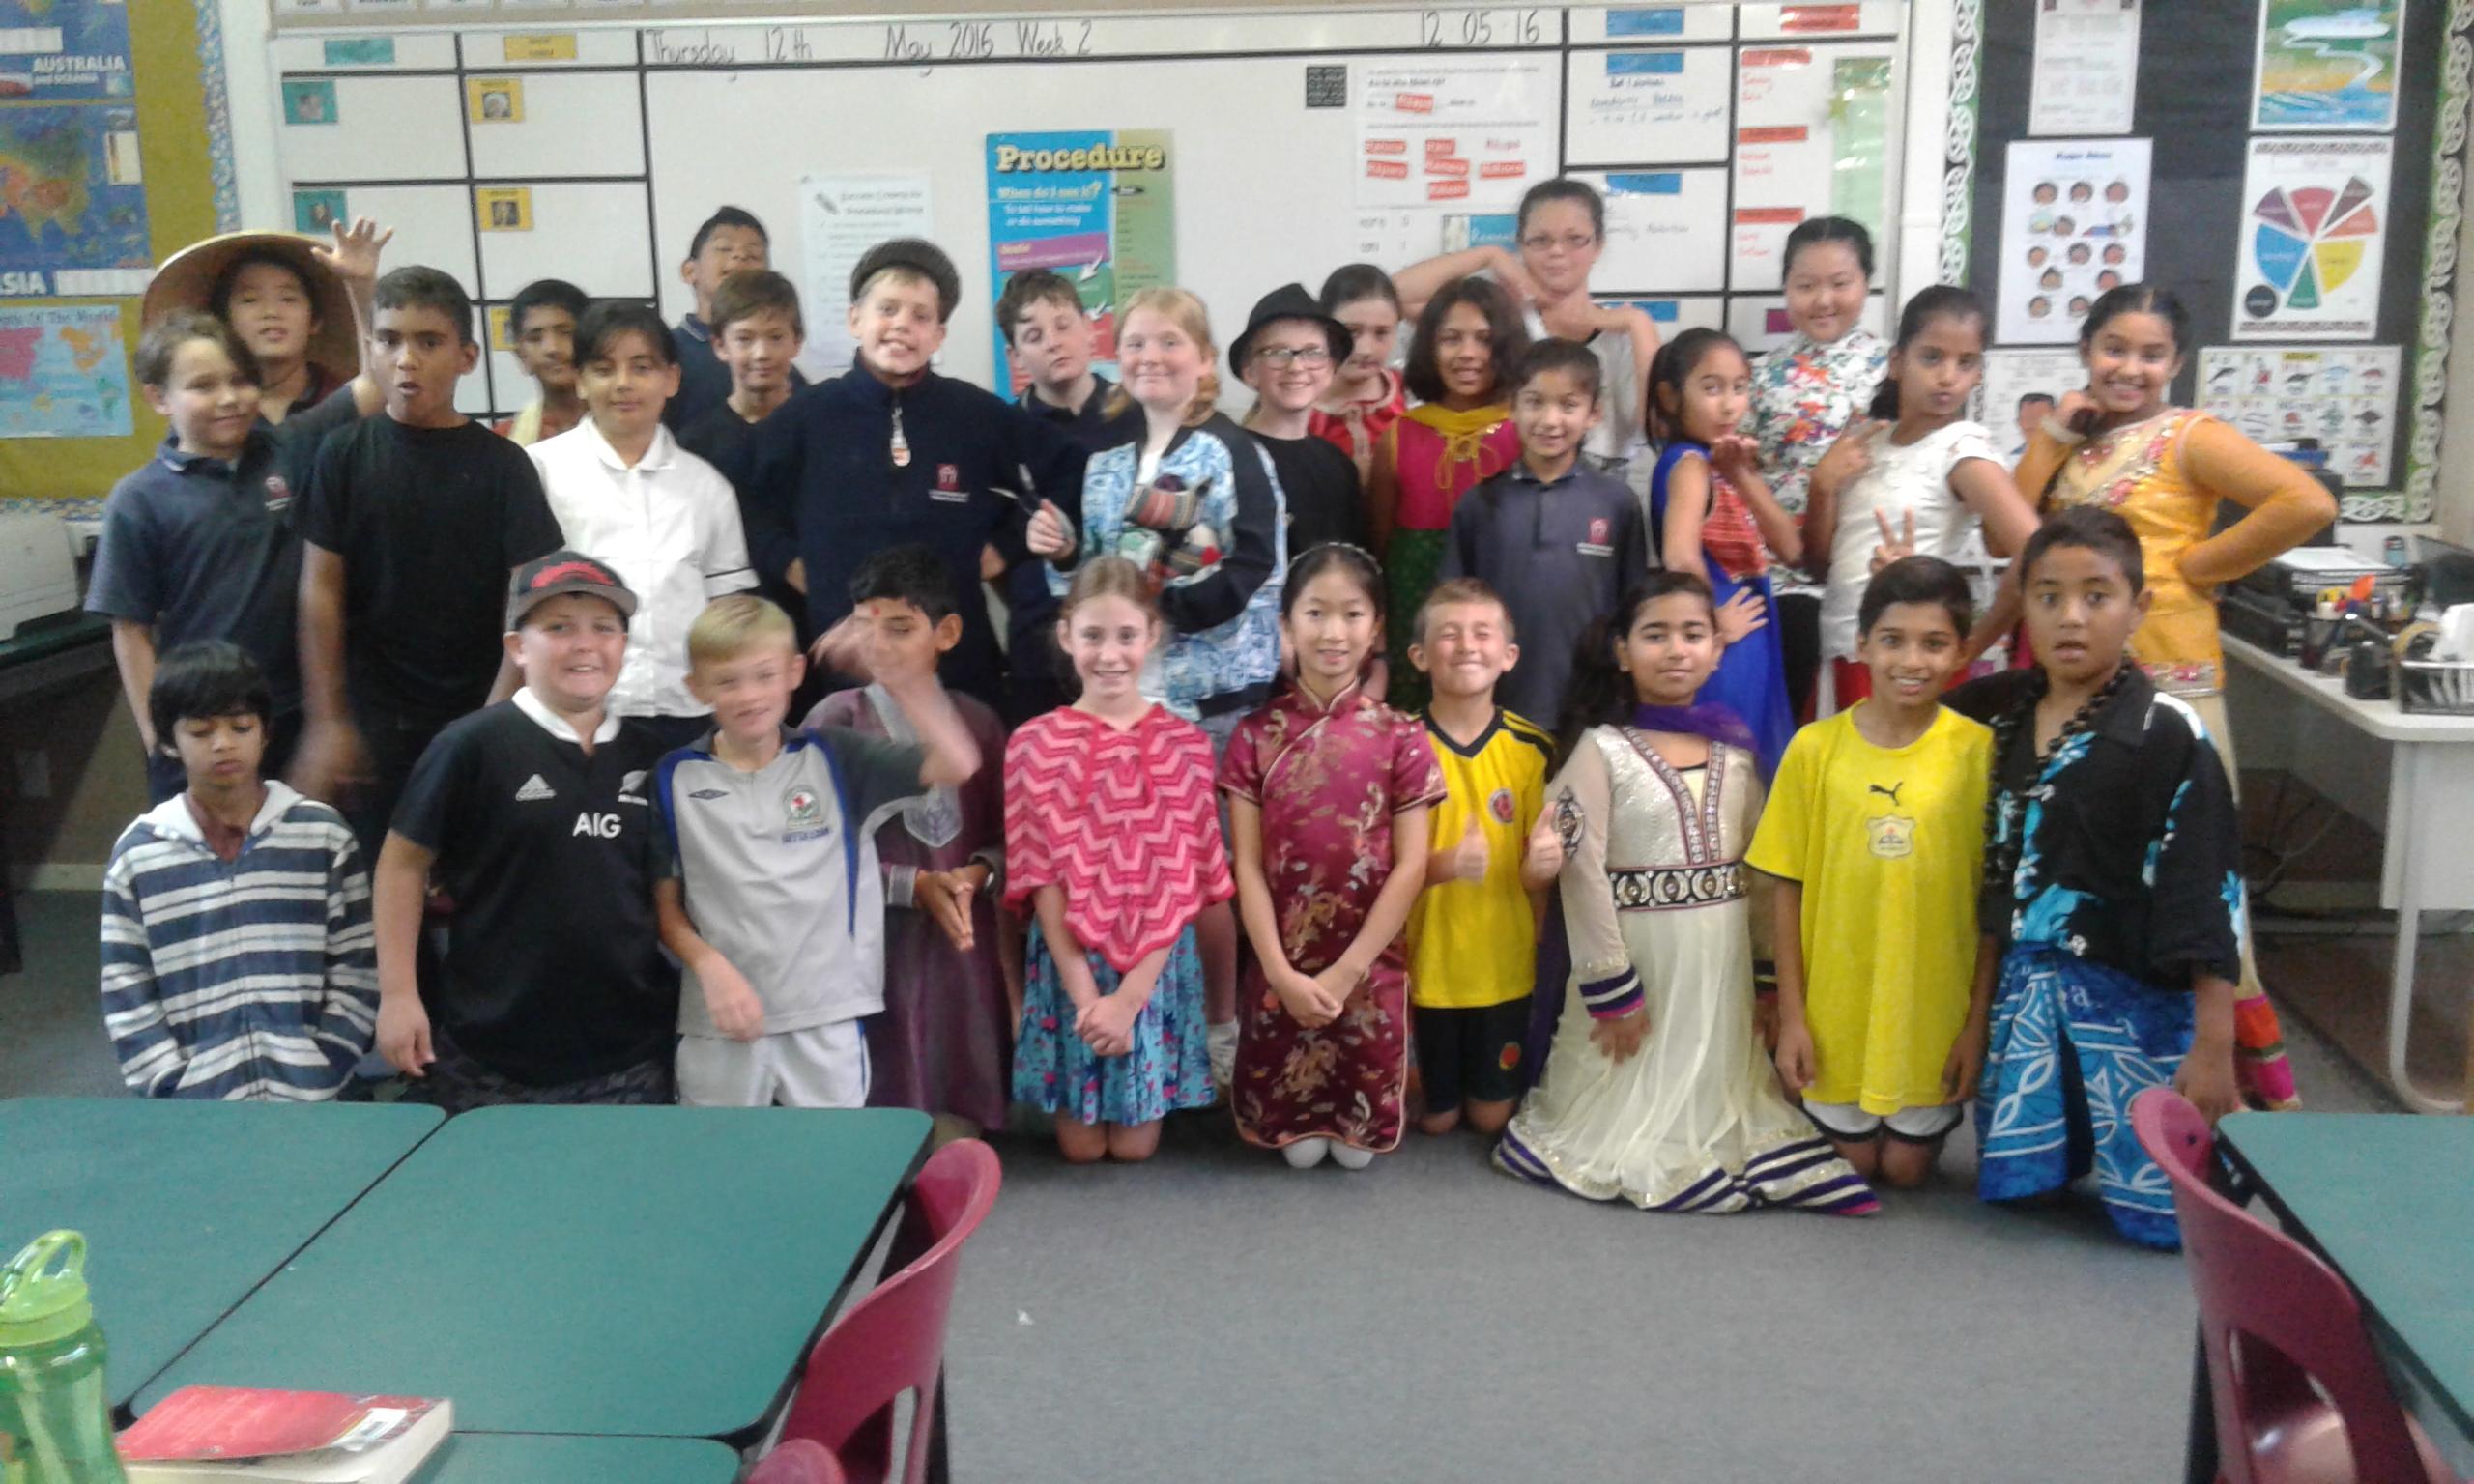 Blockhouse Bay Primary School - Diversity Day Parade (Room 2)